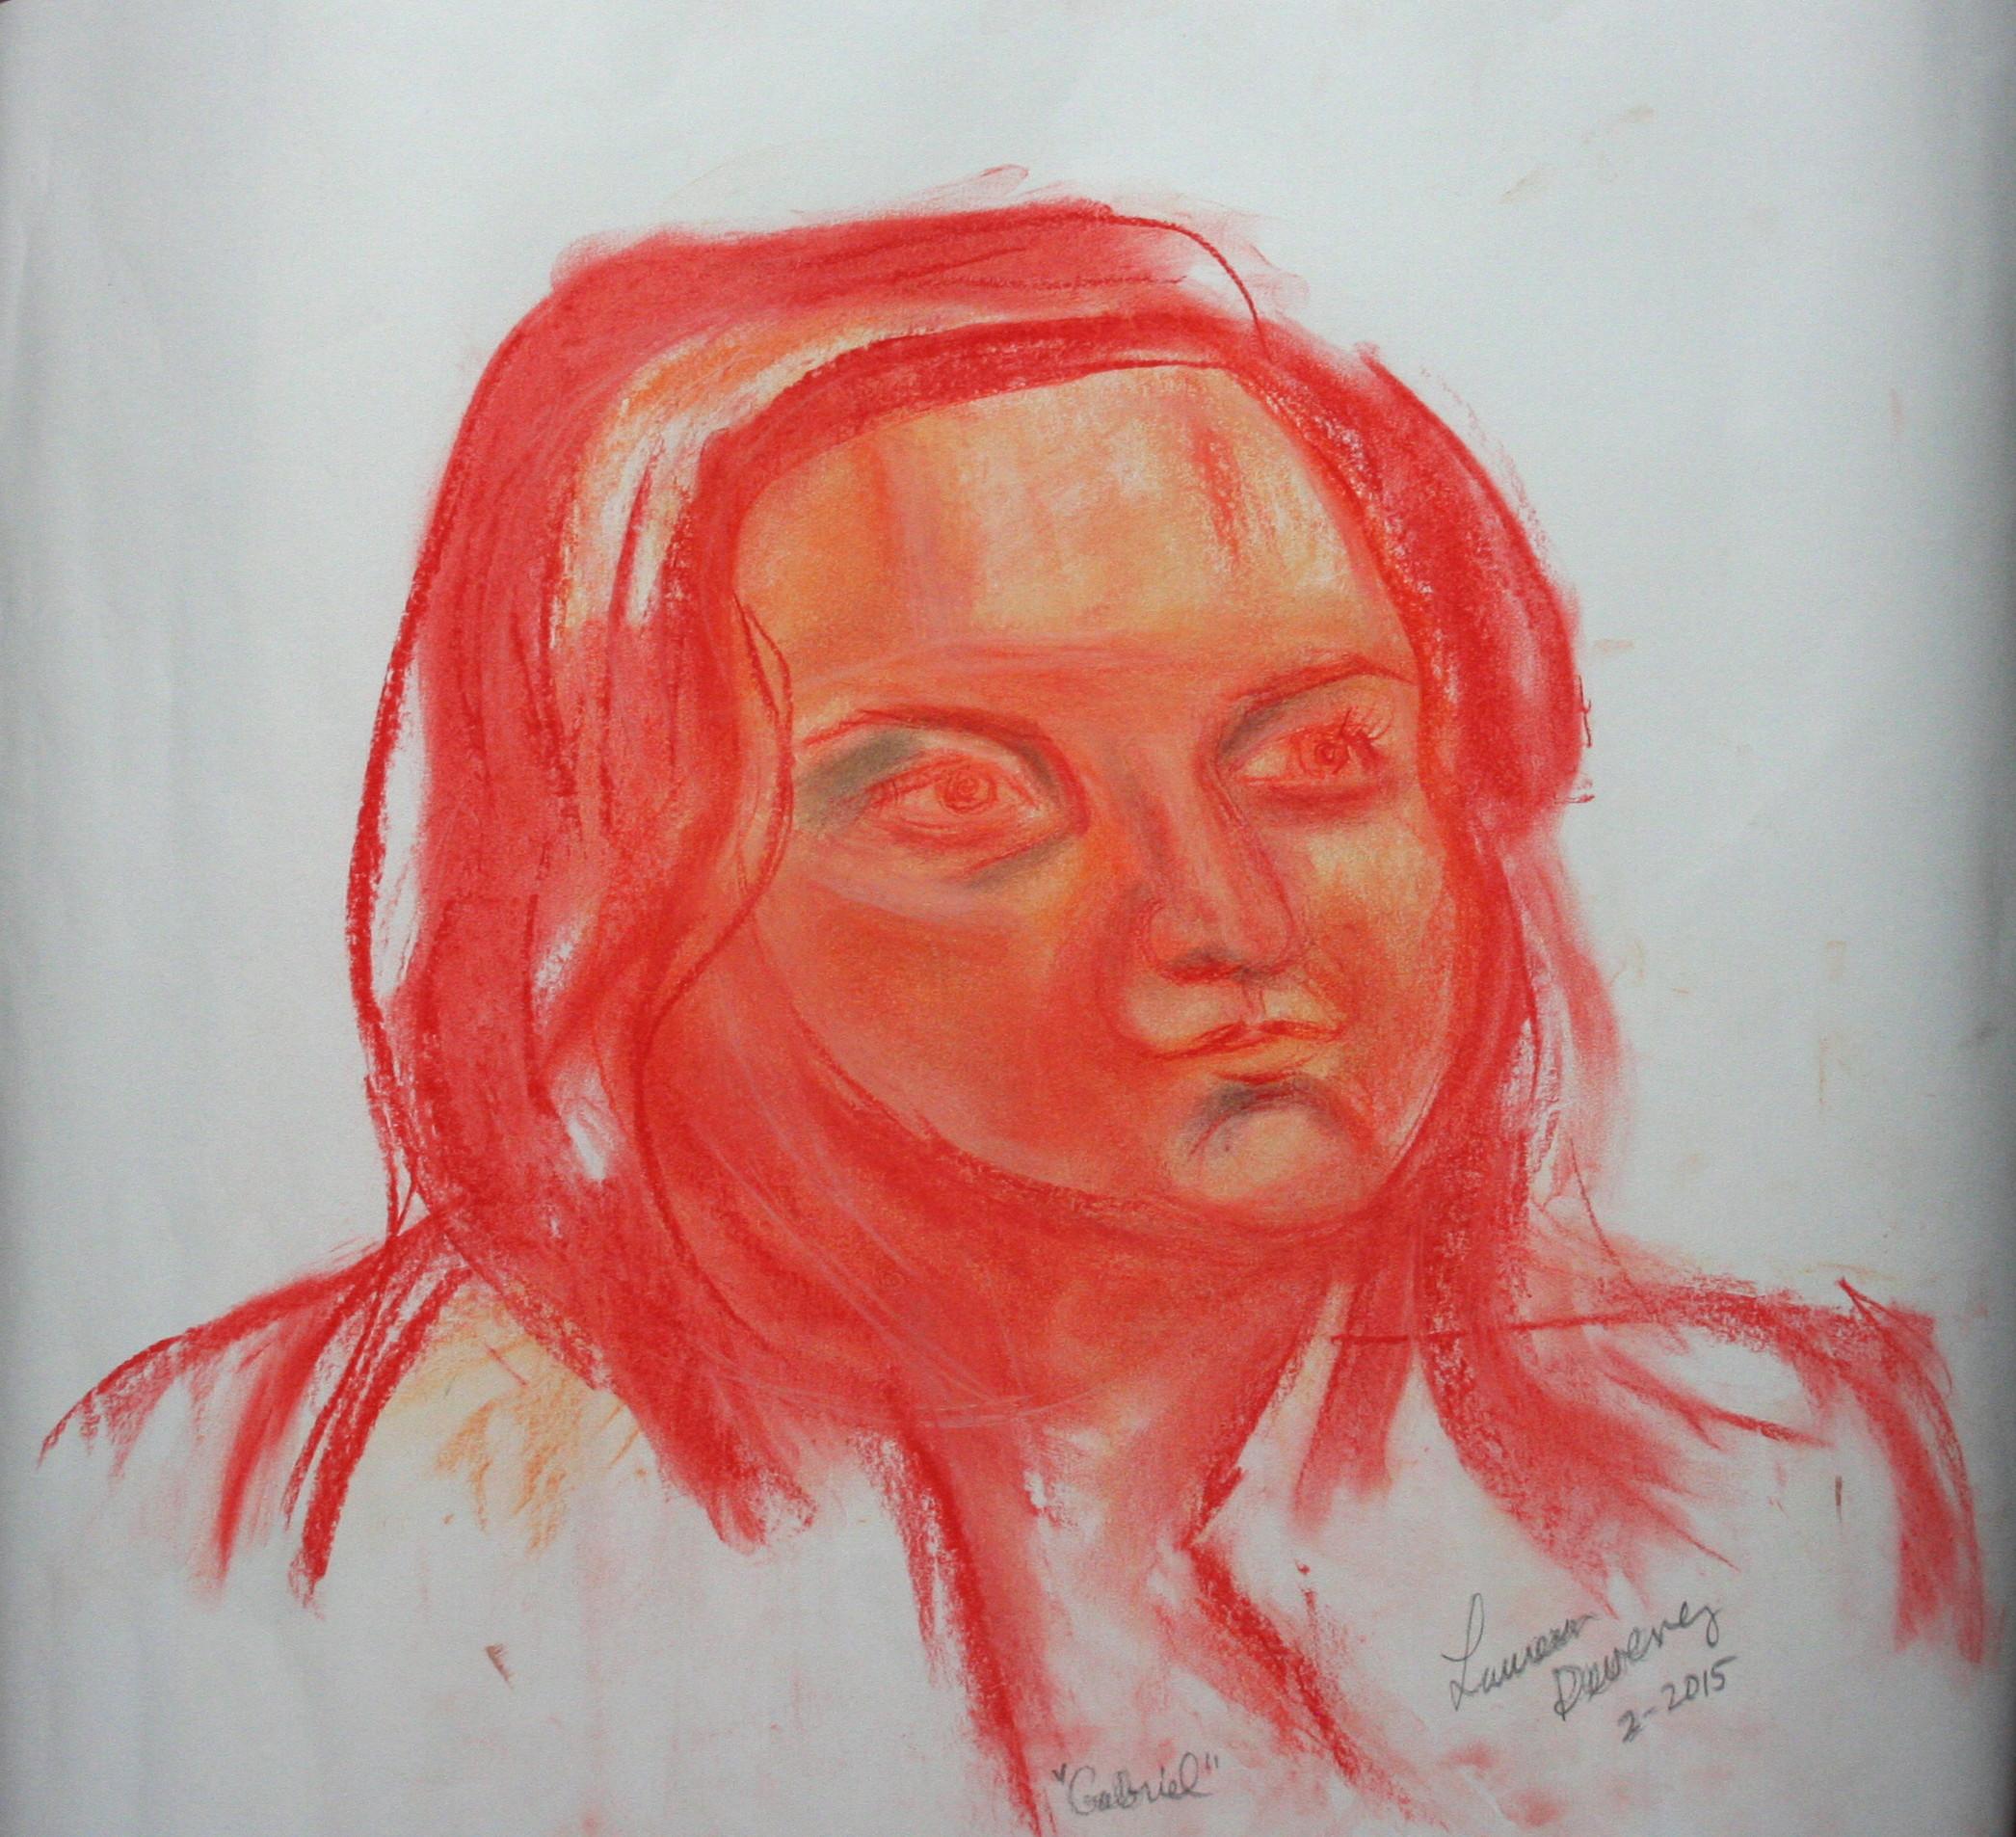 Laureen Deveney did this half hour drawing.